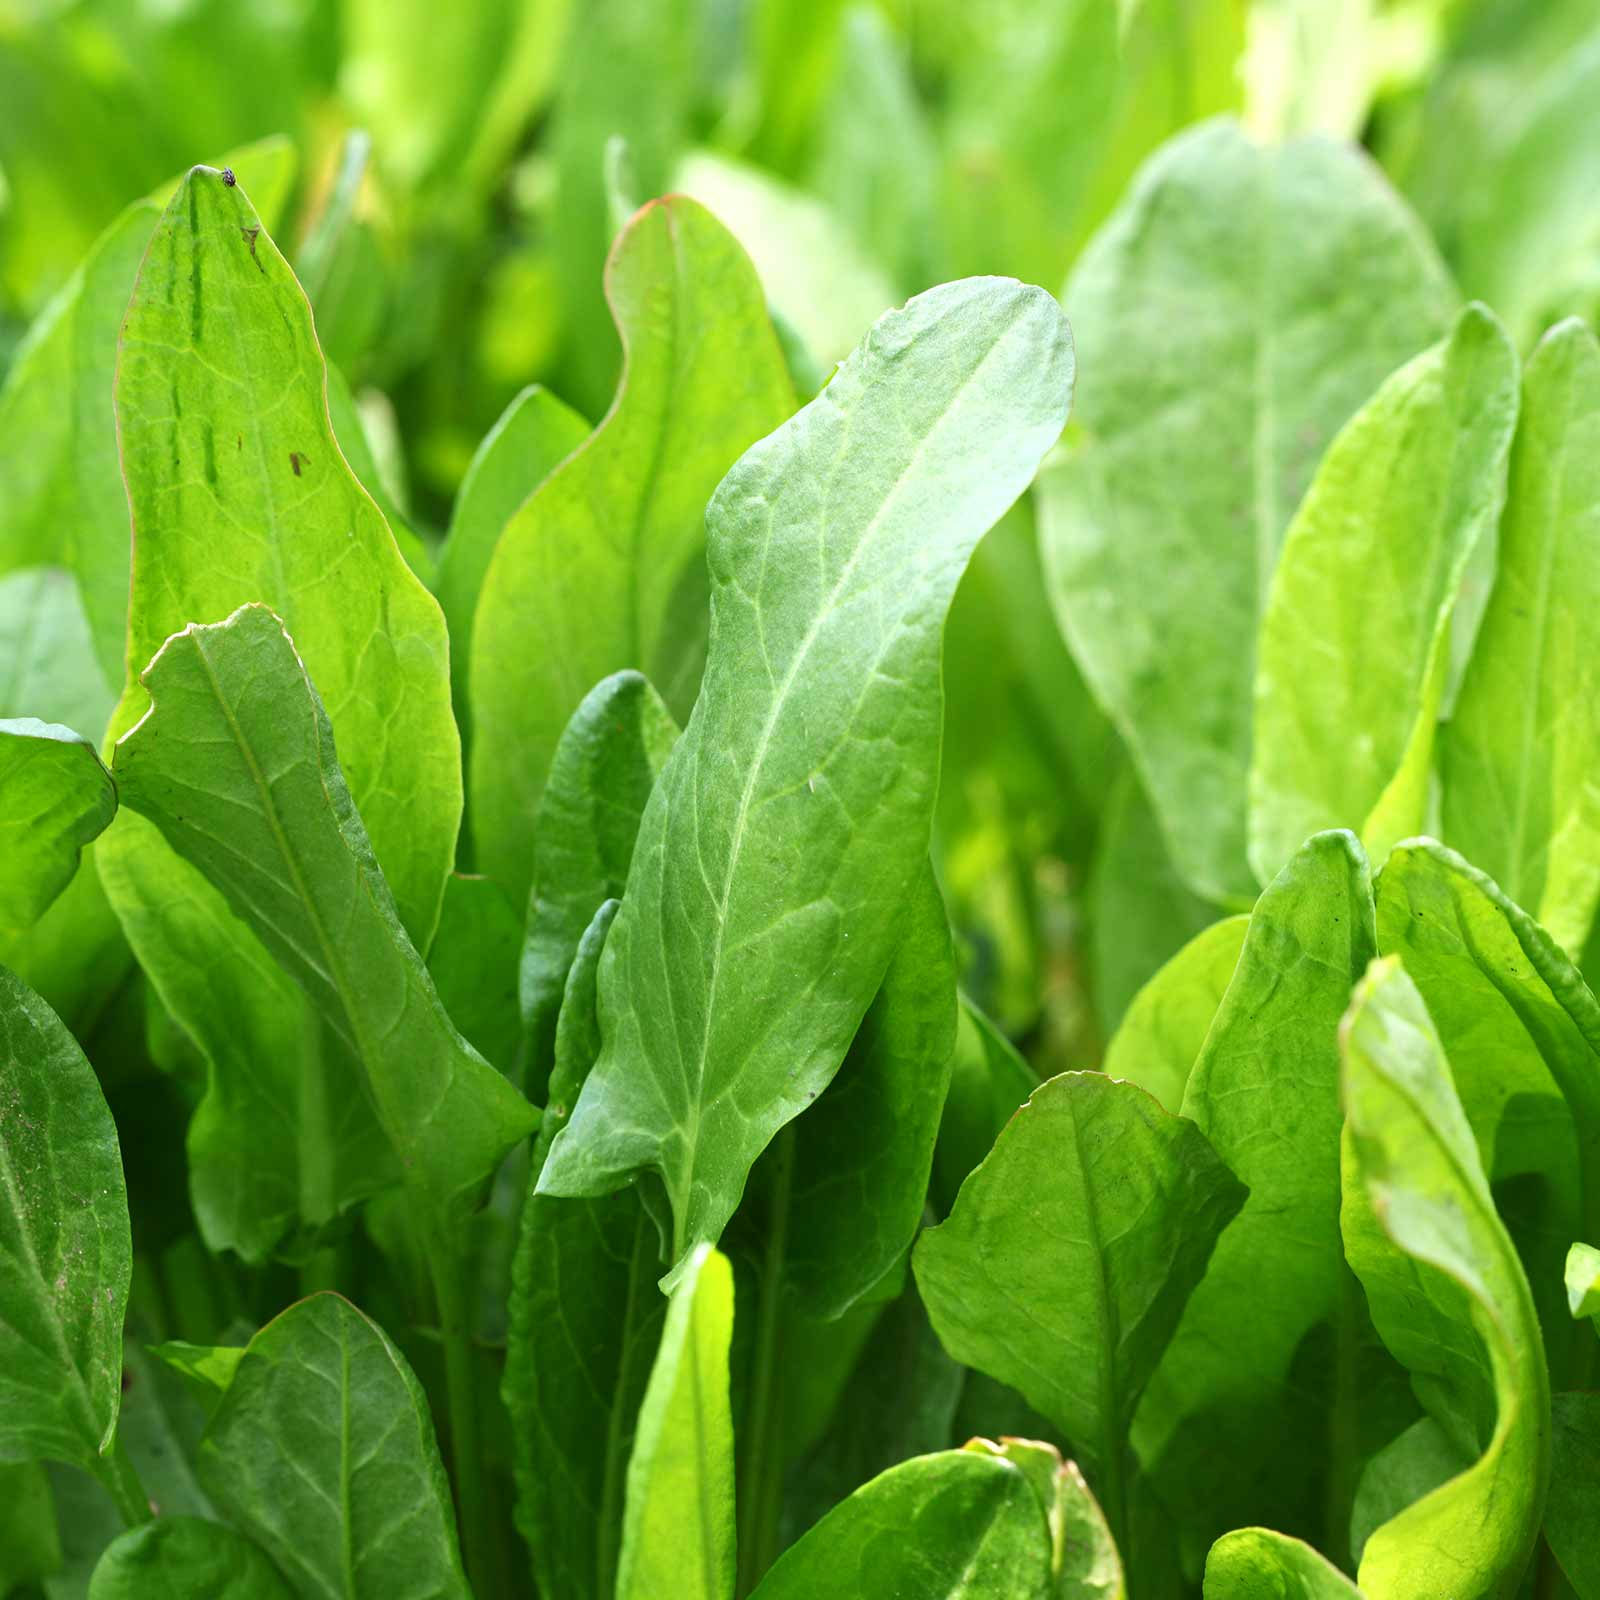 Details about  /LARGE LEAF SORREL HERB GARDEN SEEDS NON-GMO HEIRLOOM GARDENING /& MICROGREENS